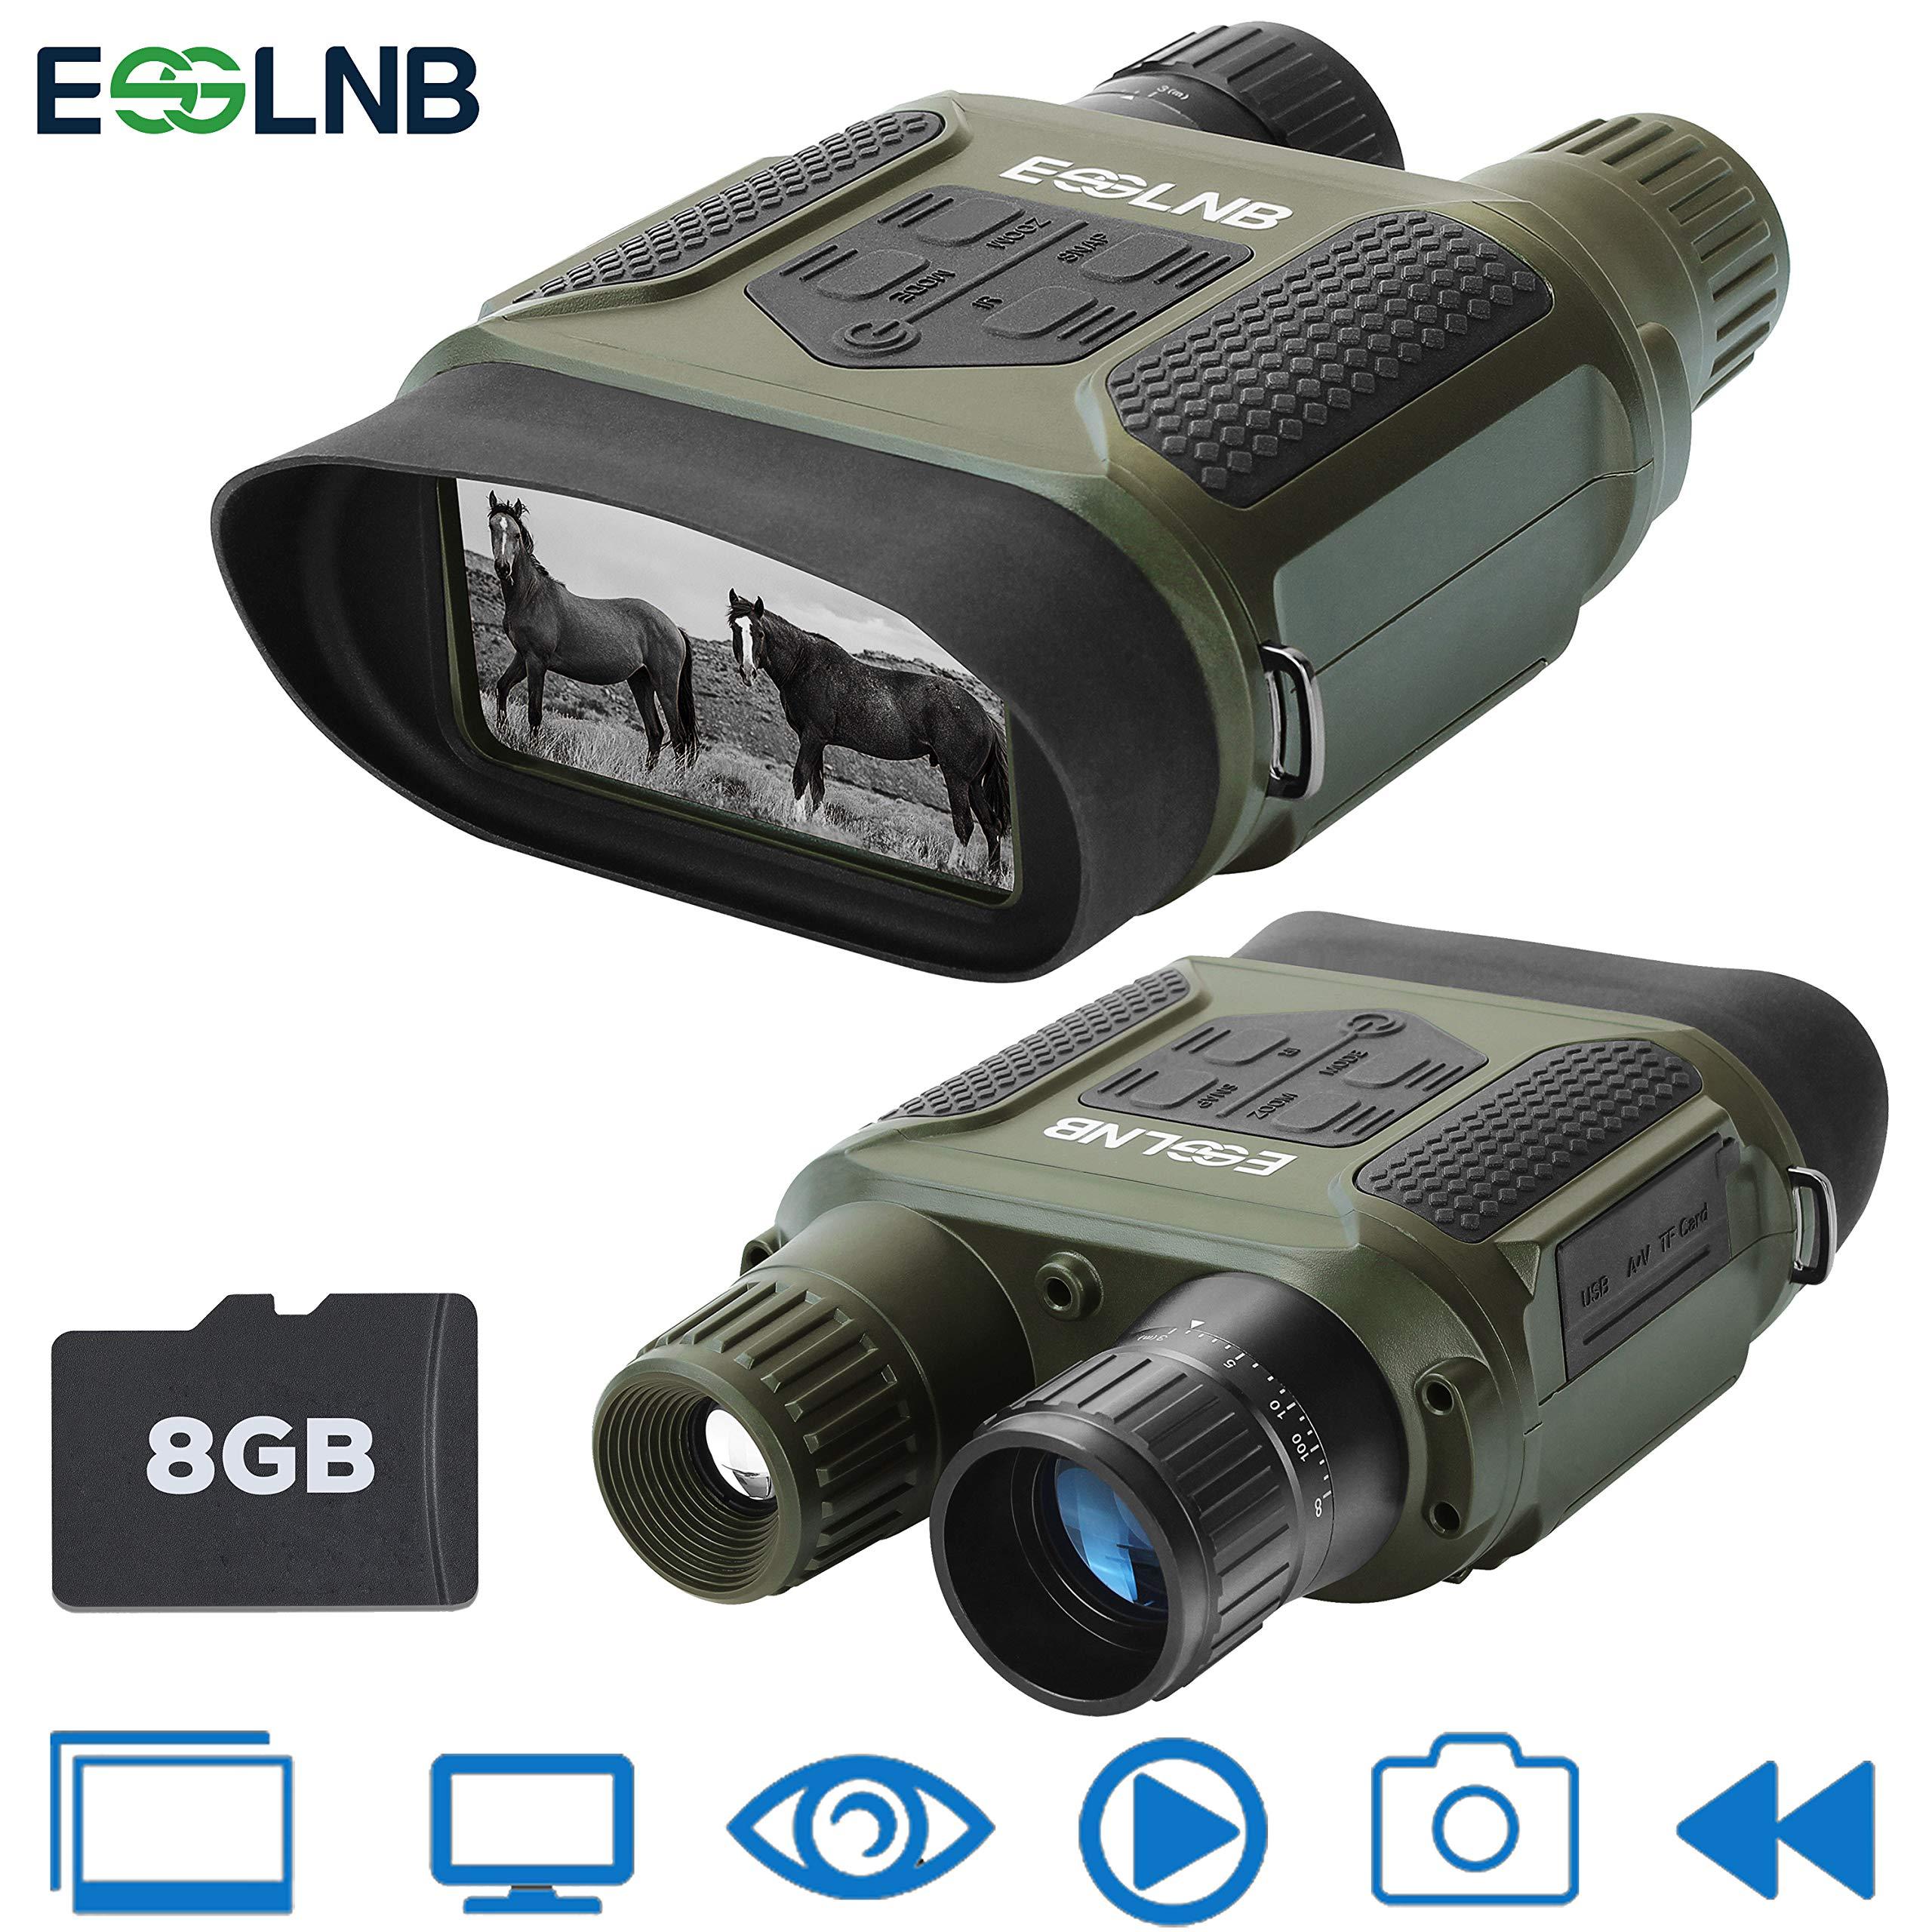 ESSLNB Night Vision Binoculars 1300ft Digital Night Vision Scope 7x31 Infrared Night Vision Hunting Binocular with 2'' TFT LCD and 8GB TF Card Photo Camera Video Recorder Playback Function by ESSLNB